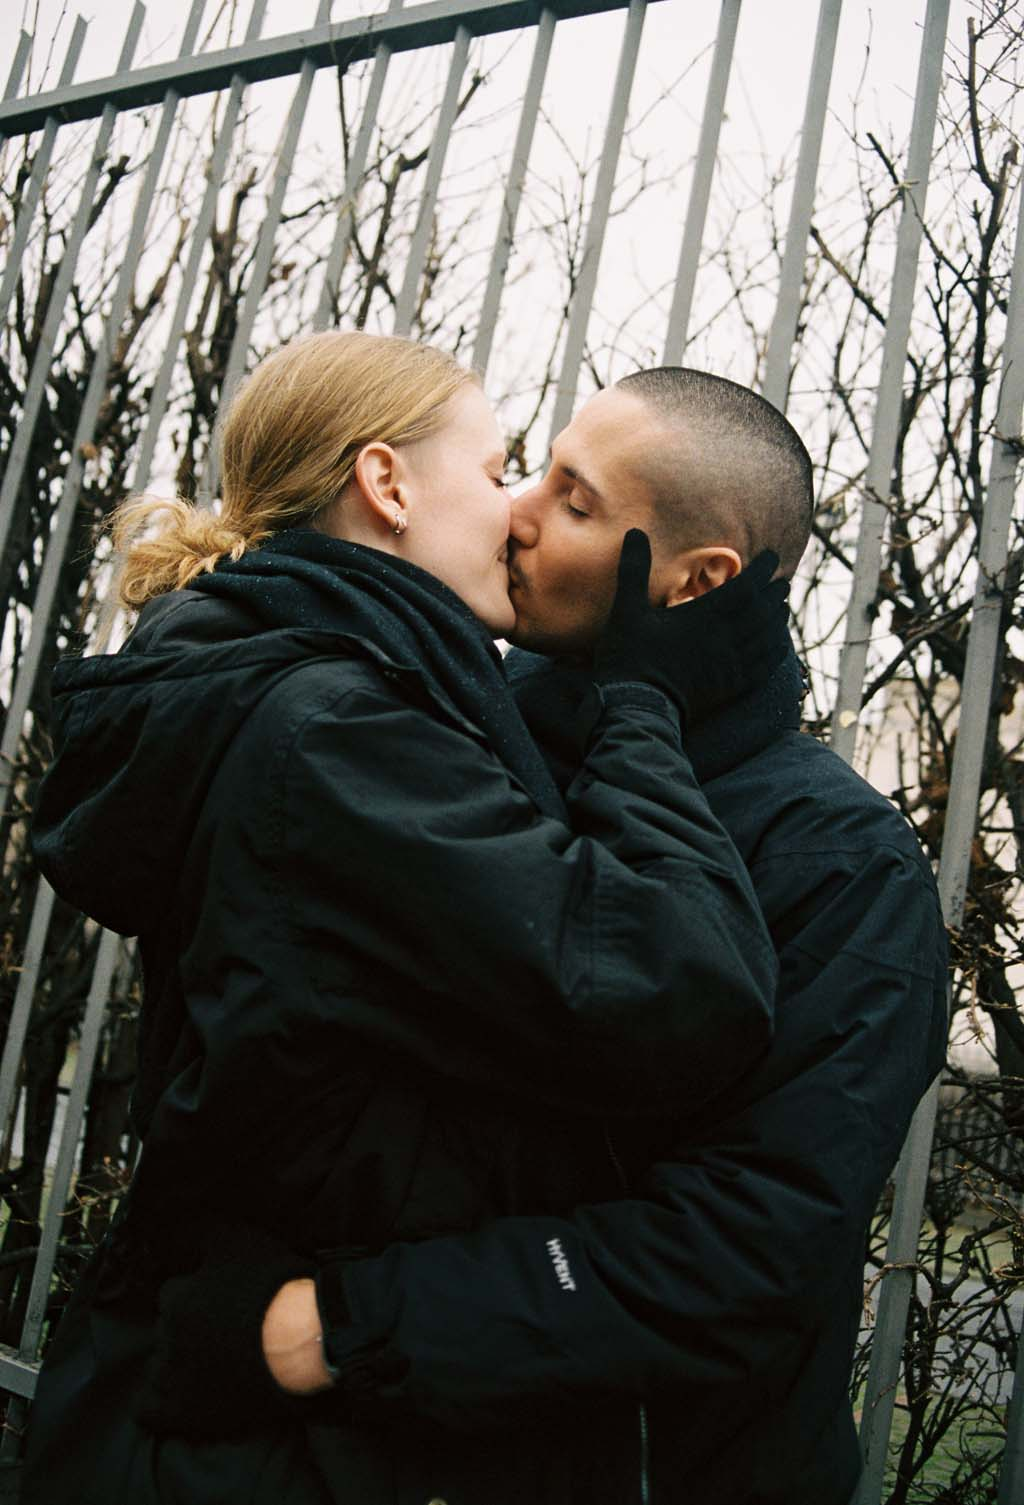 NachtclubsBerlin couple qui s'embrasse